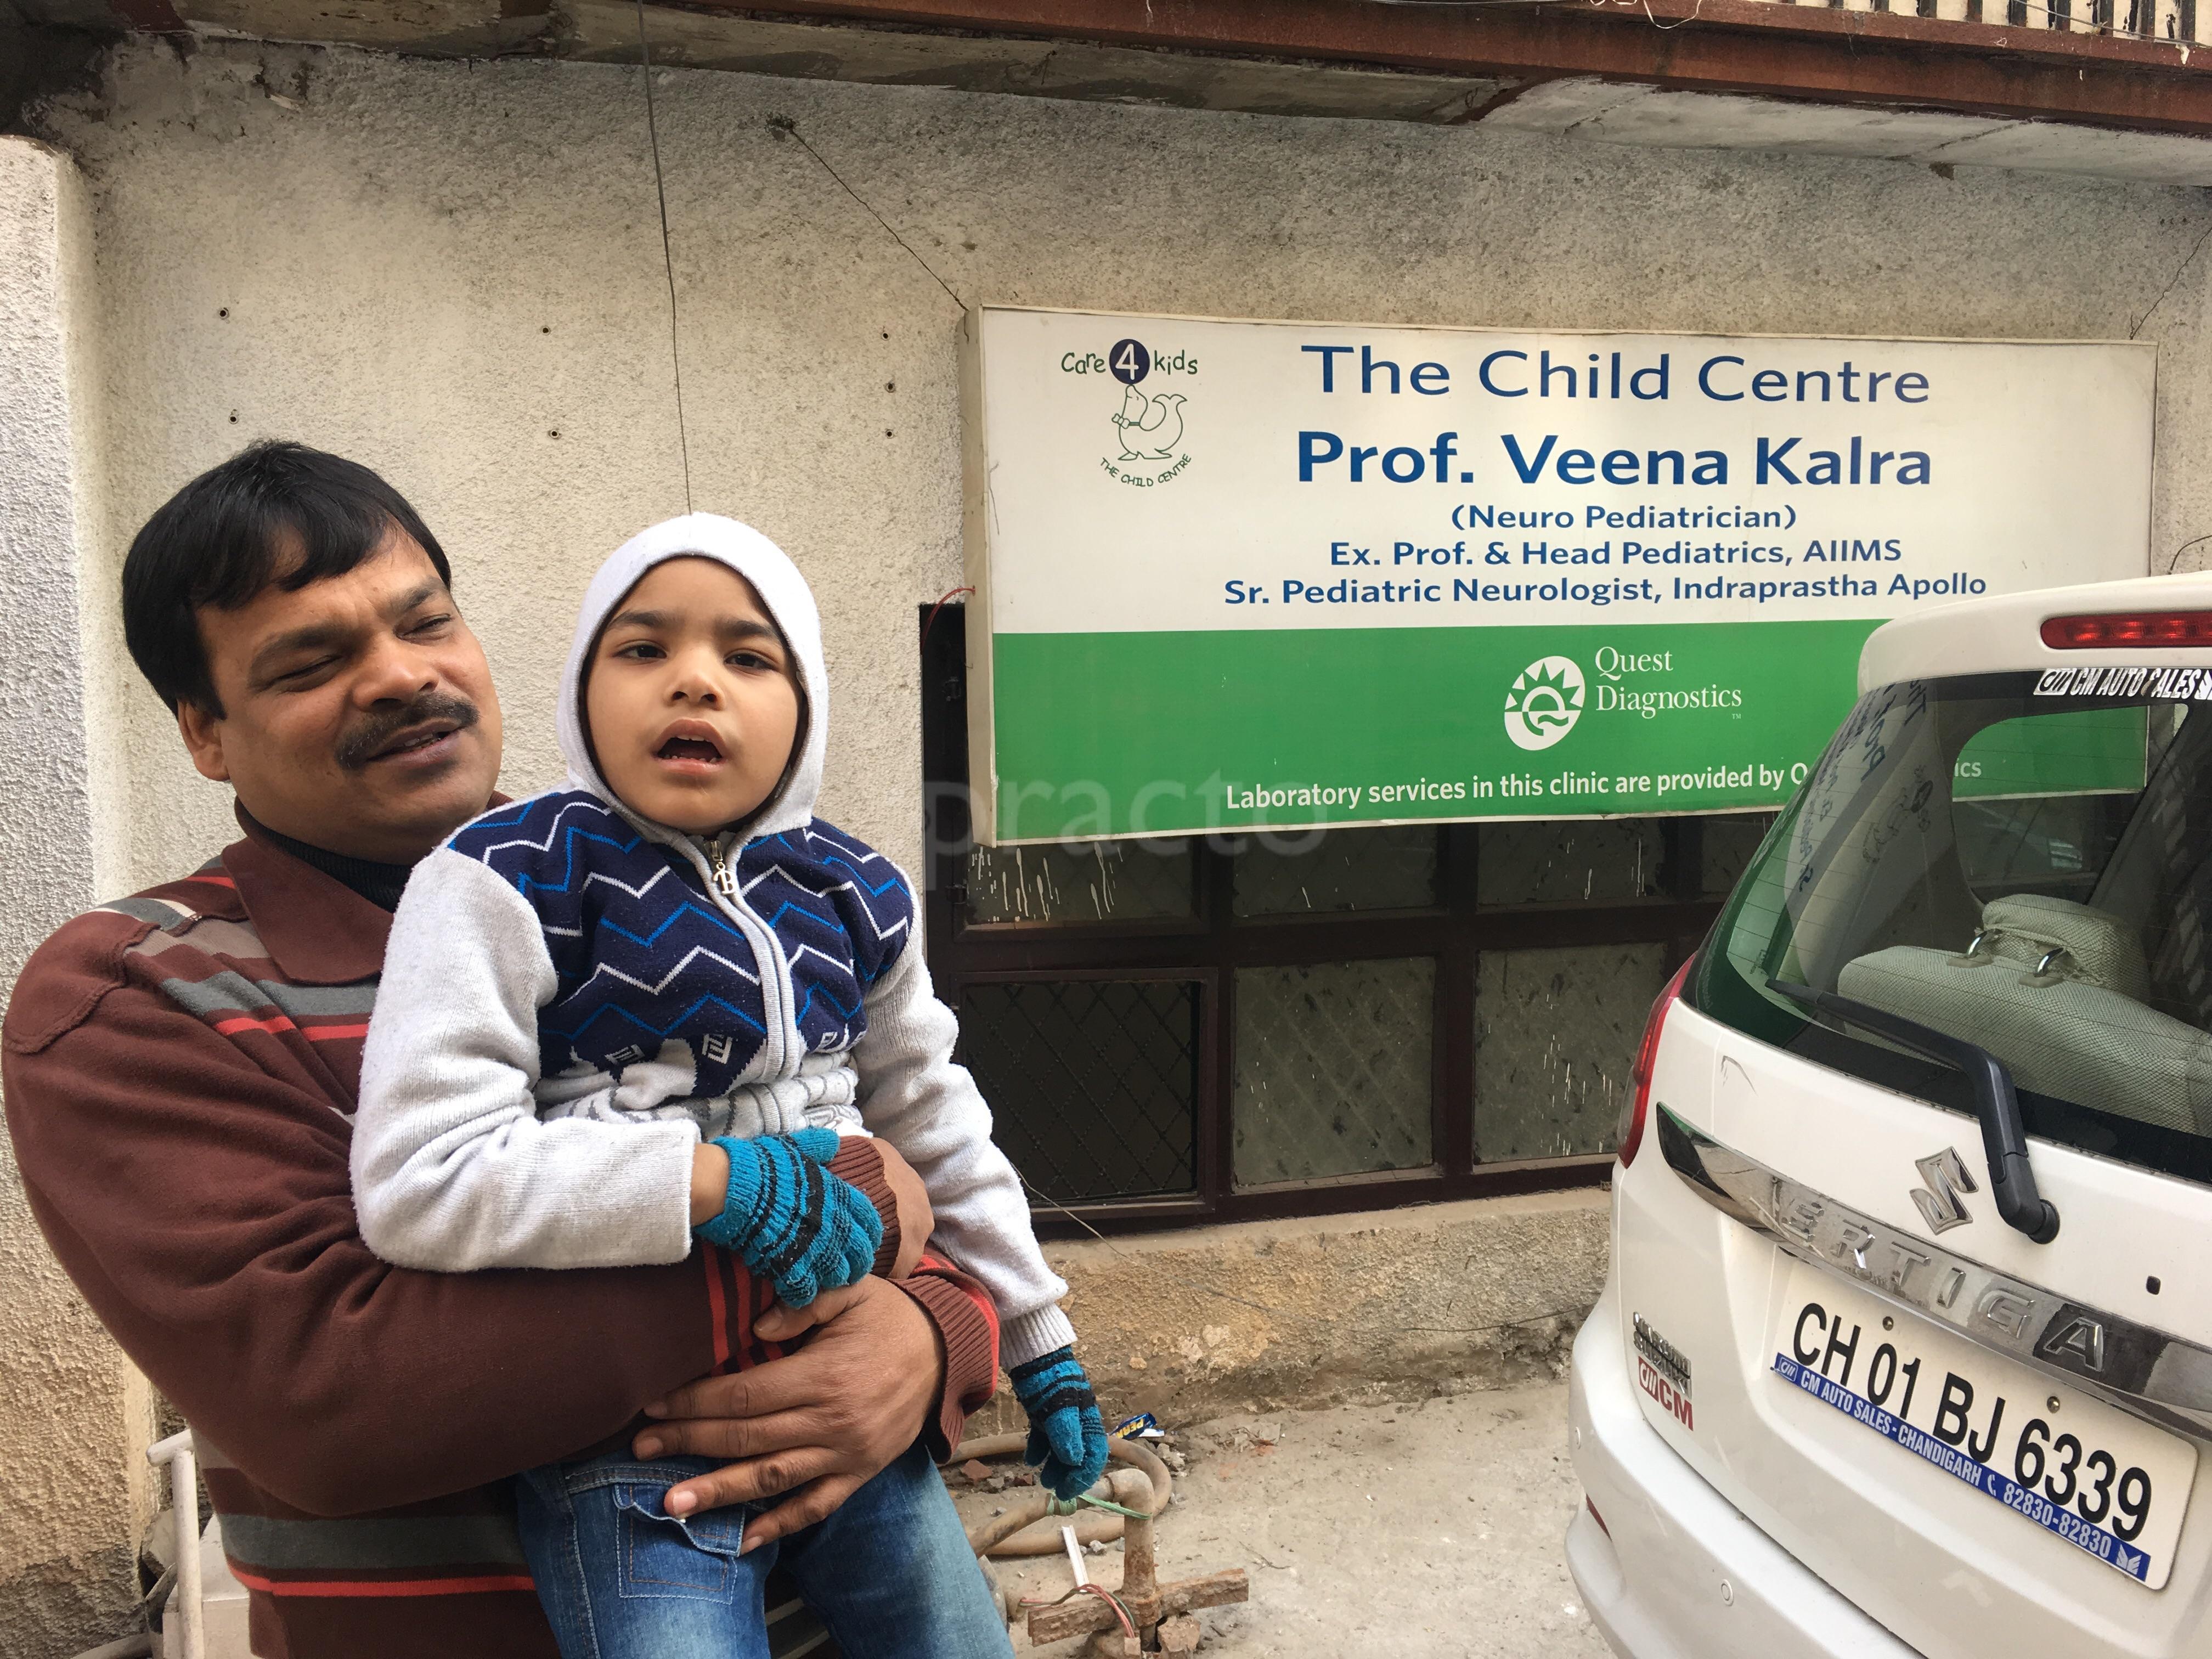 Call the doctor: Pediatric neurology